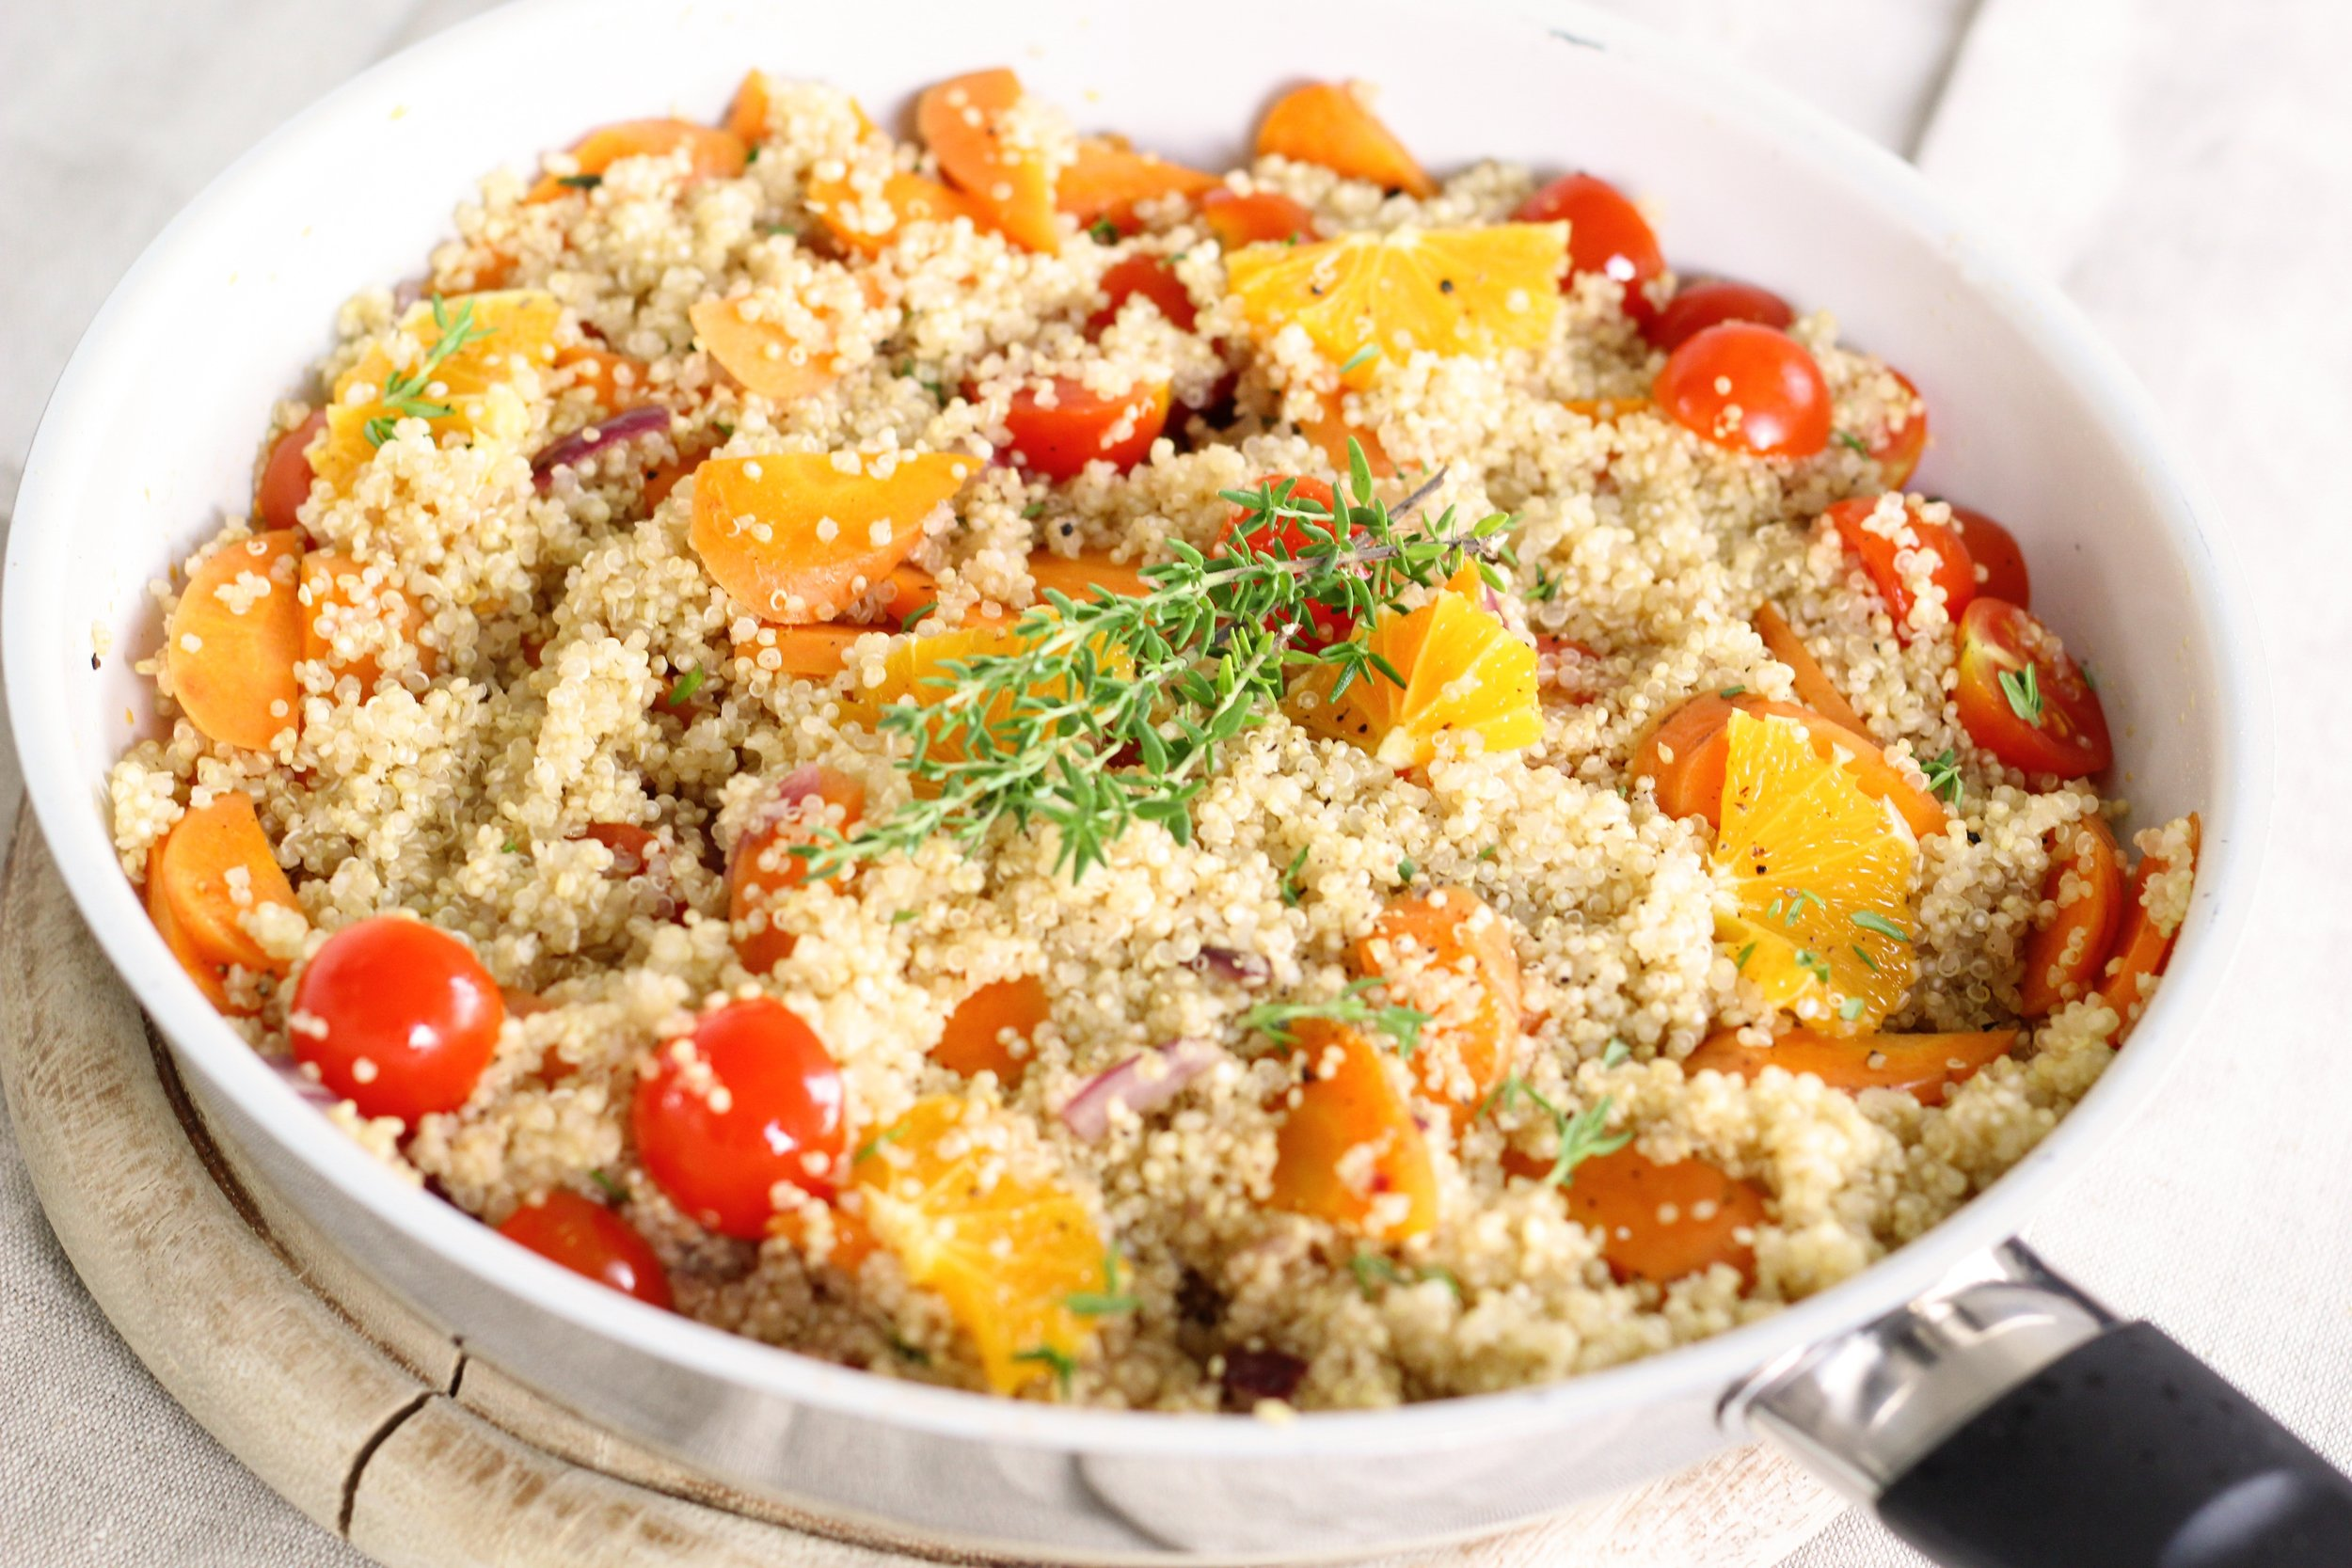 prajna-wellness=abbotsford-ayurveda-food-recipes.jpg